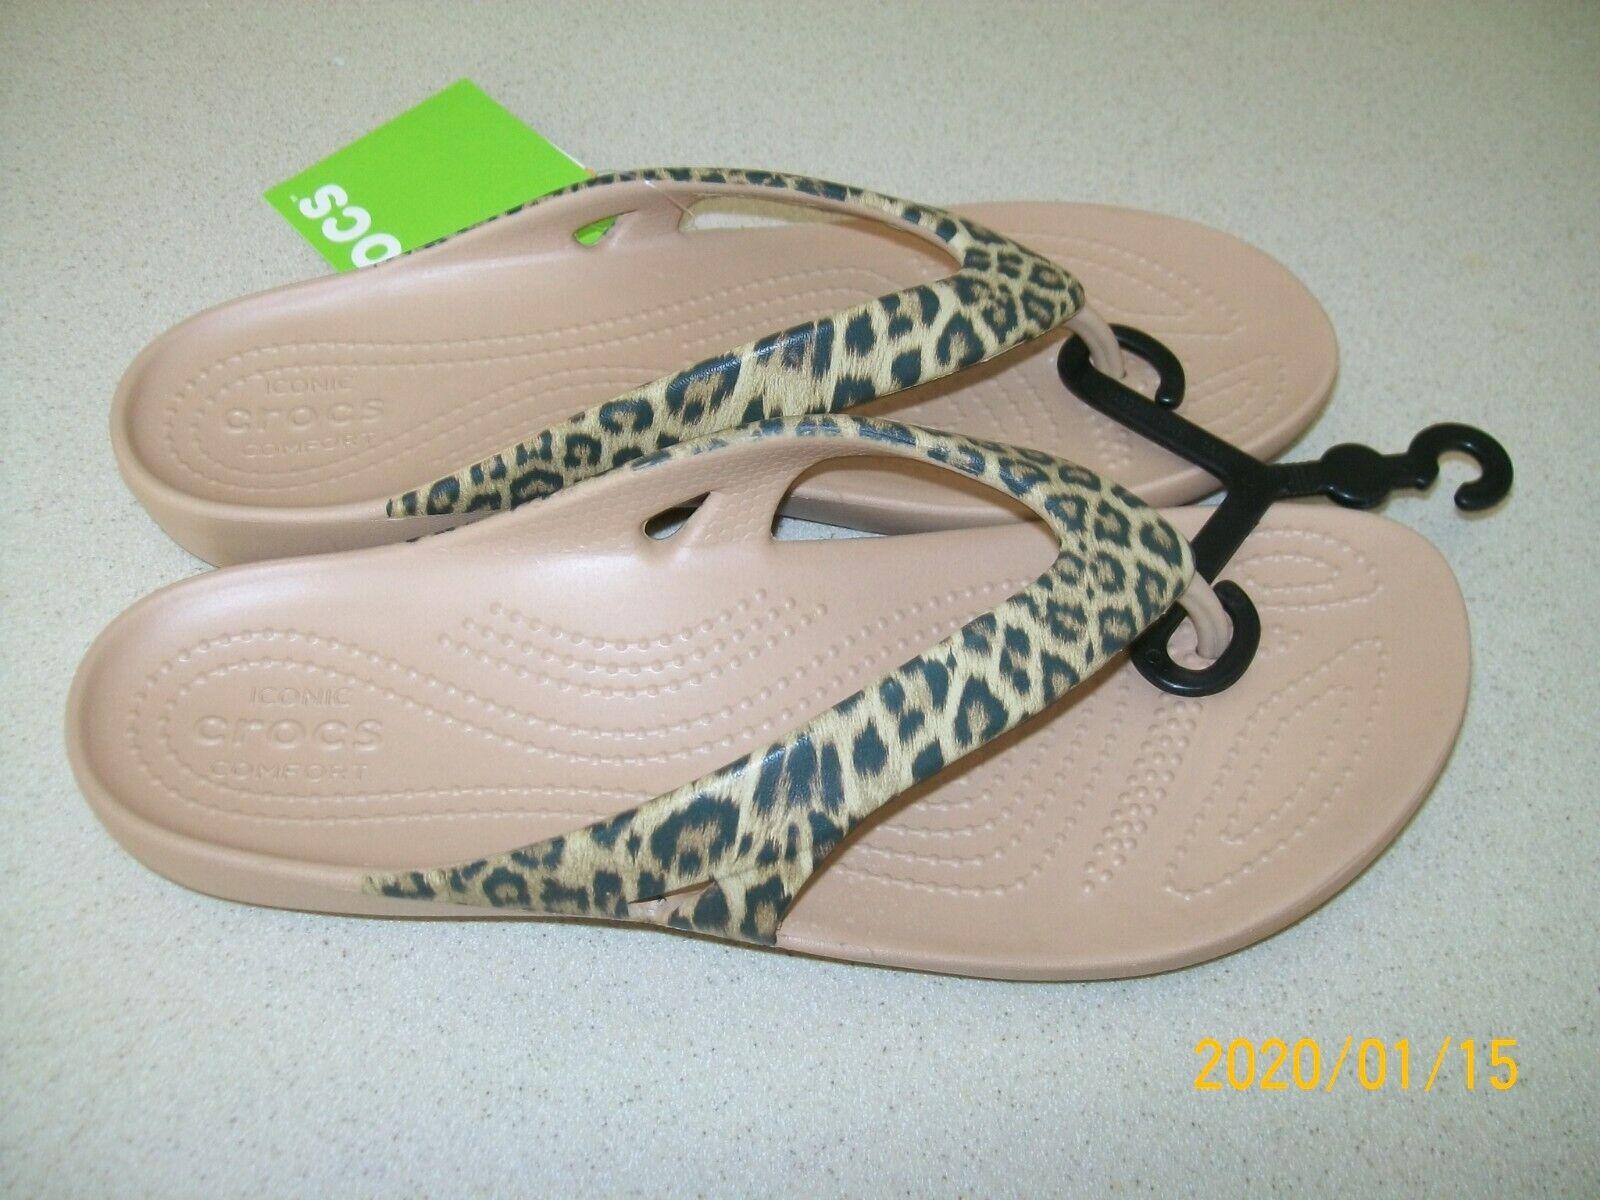 Crocs Kadee II Leopard Print Flip-Flop